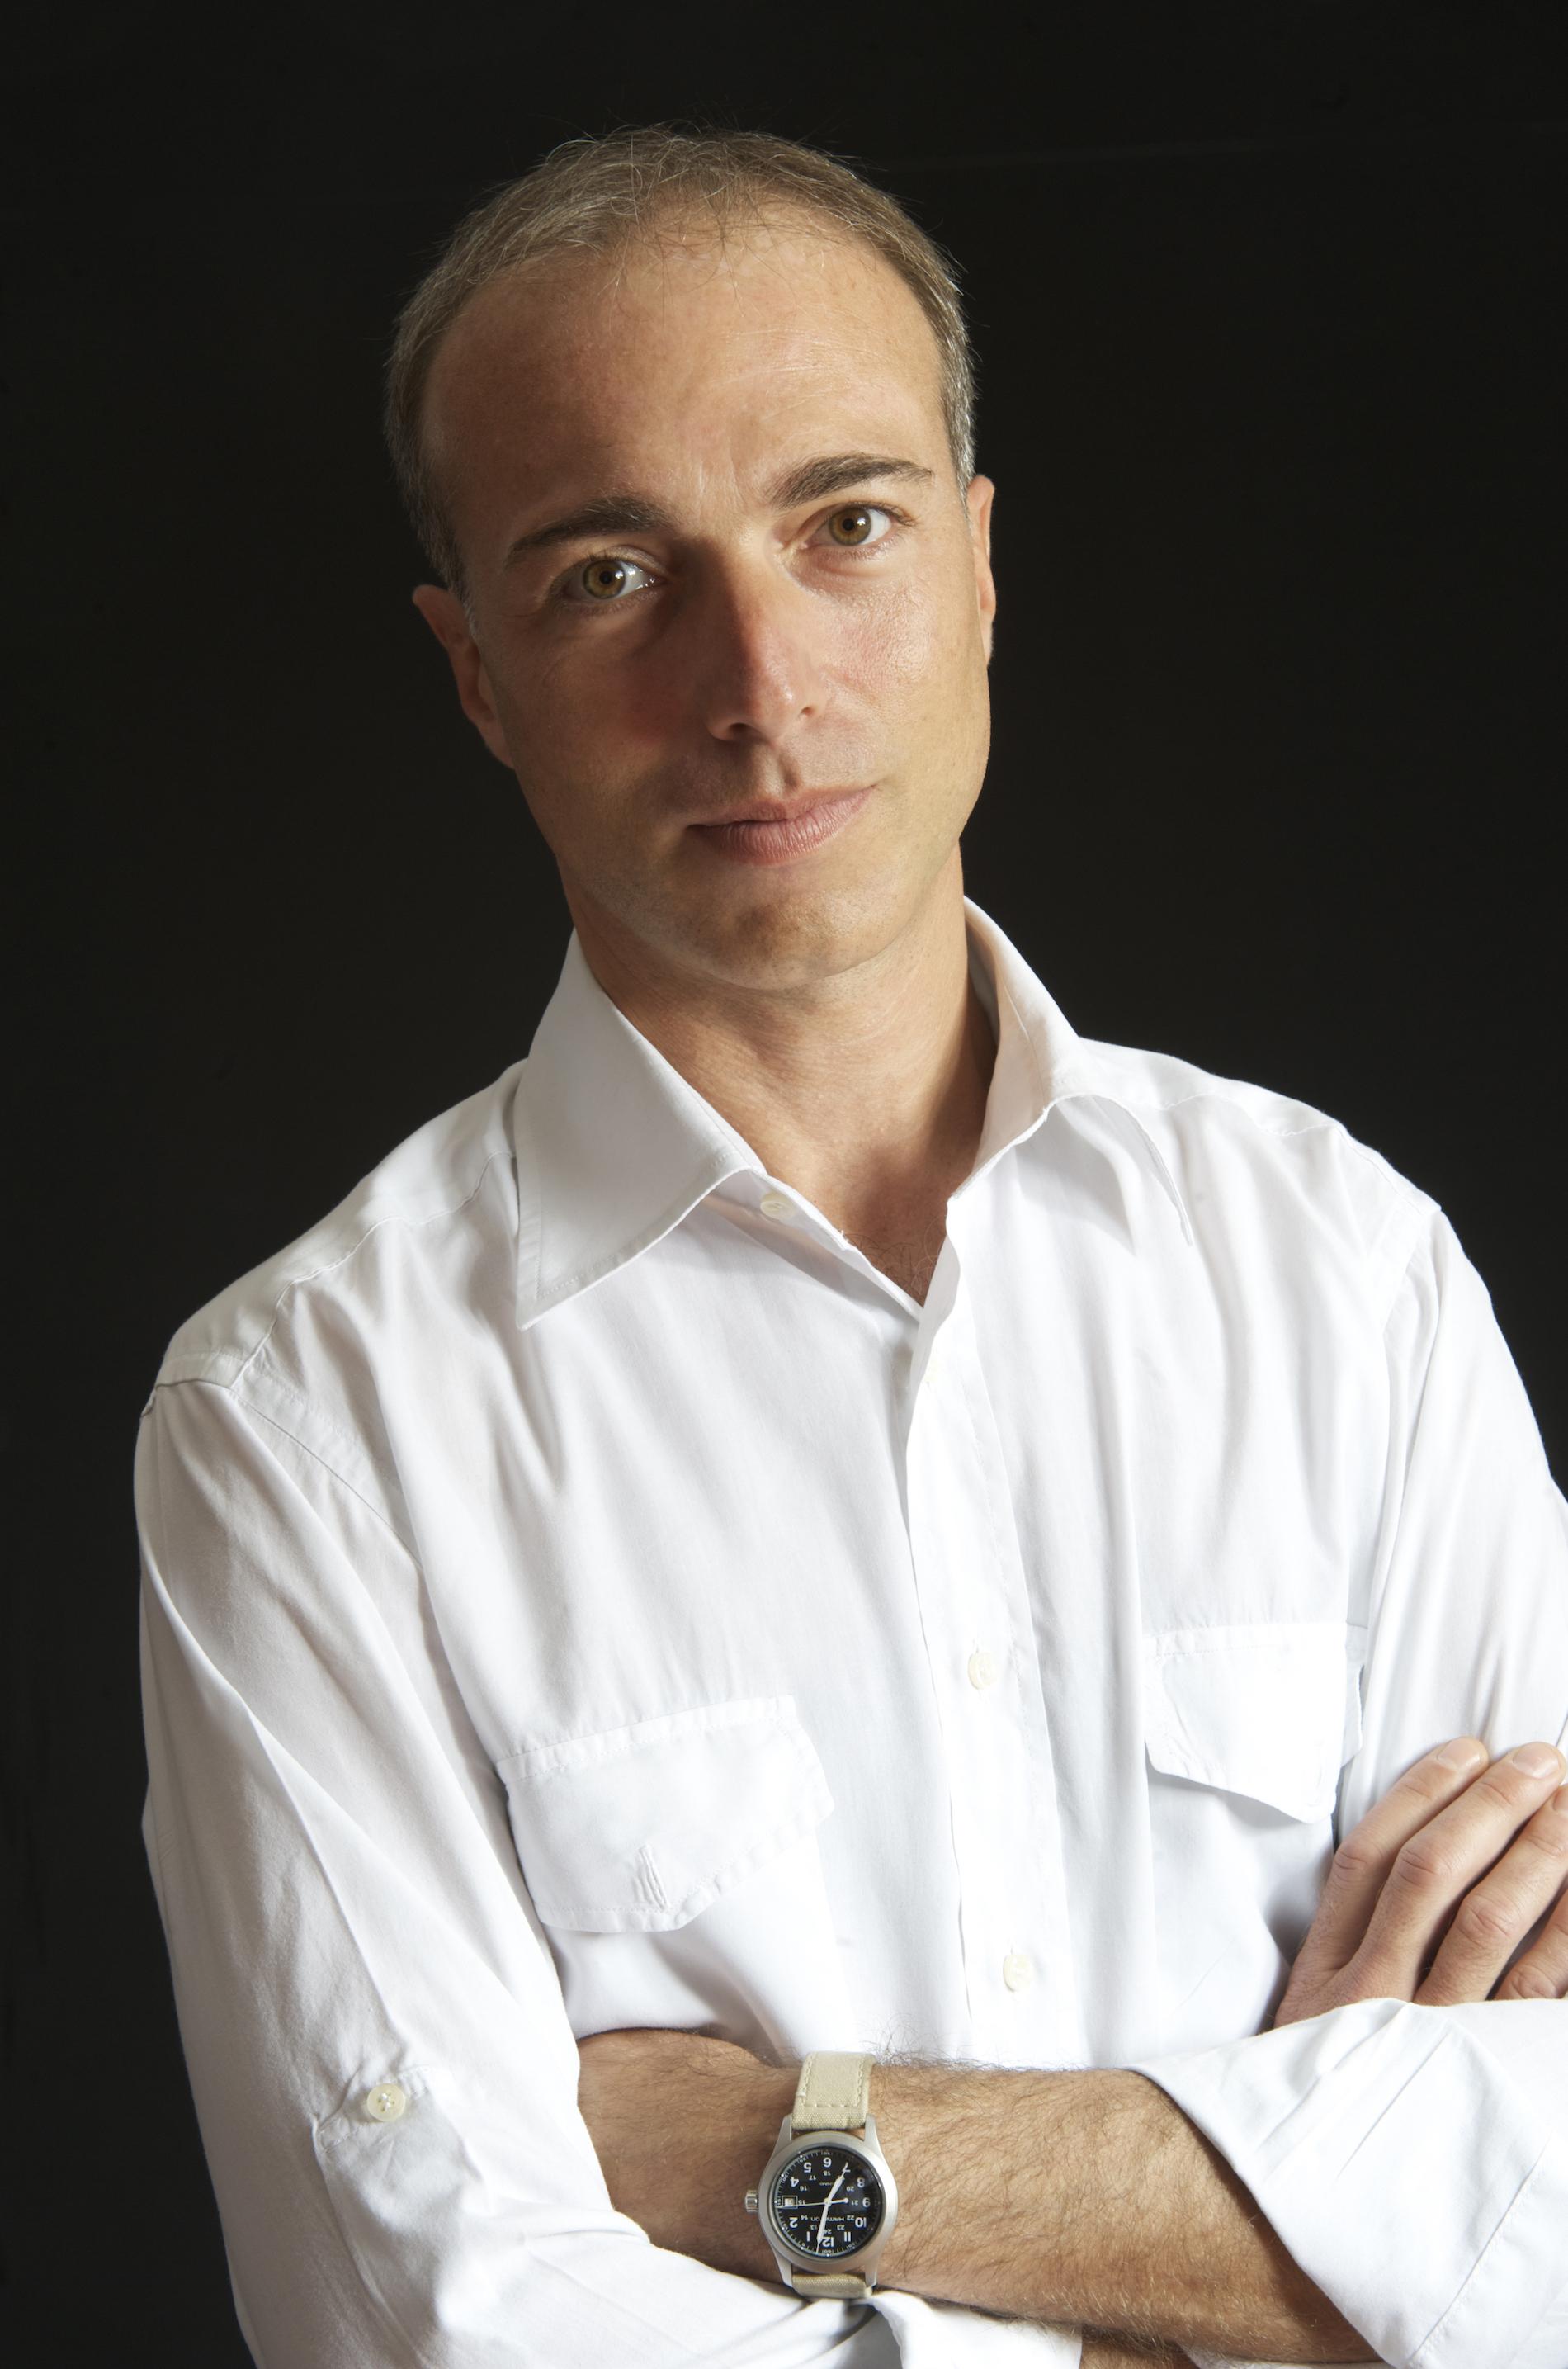 Massimo Reverberi